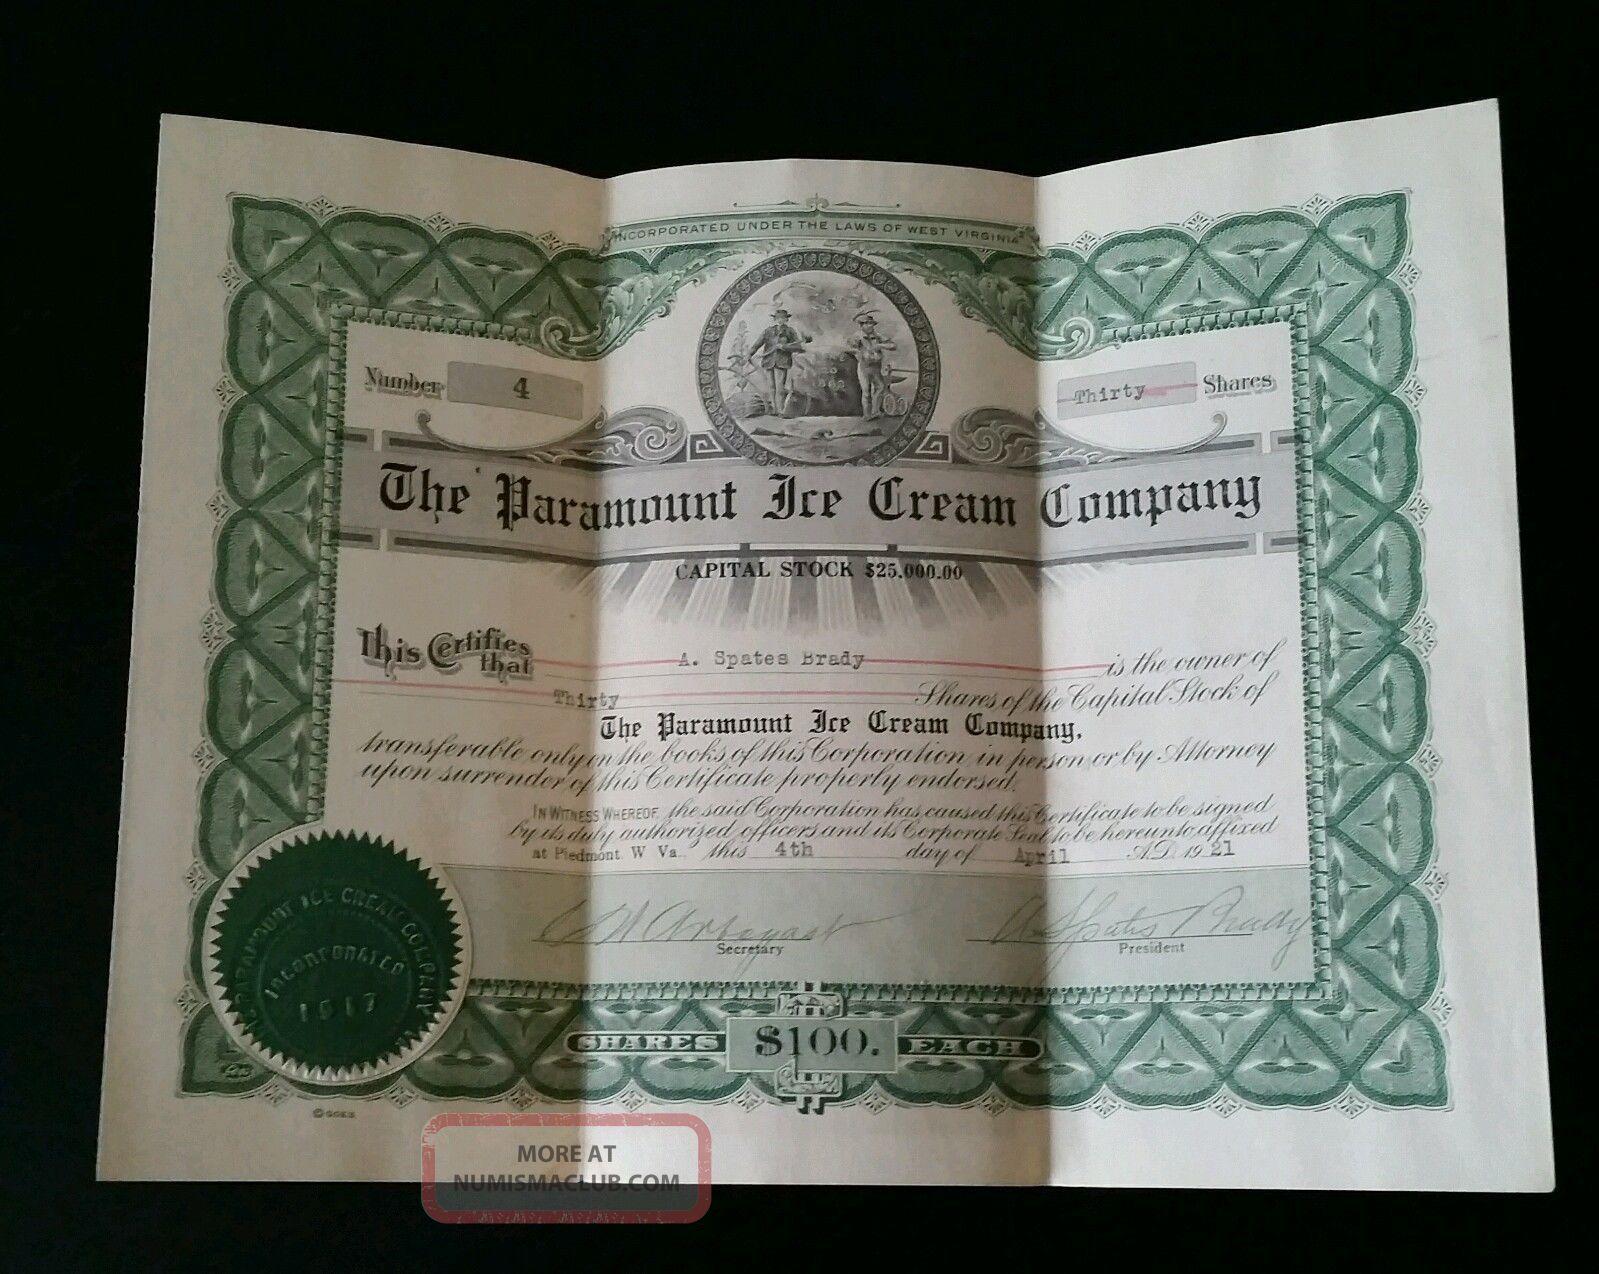 The Paramount Ice Cream Company Stock Certificate 1921 Stocks & Bonds, Scripophily photo